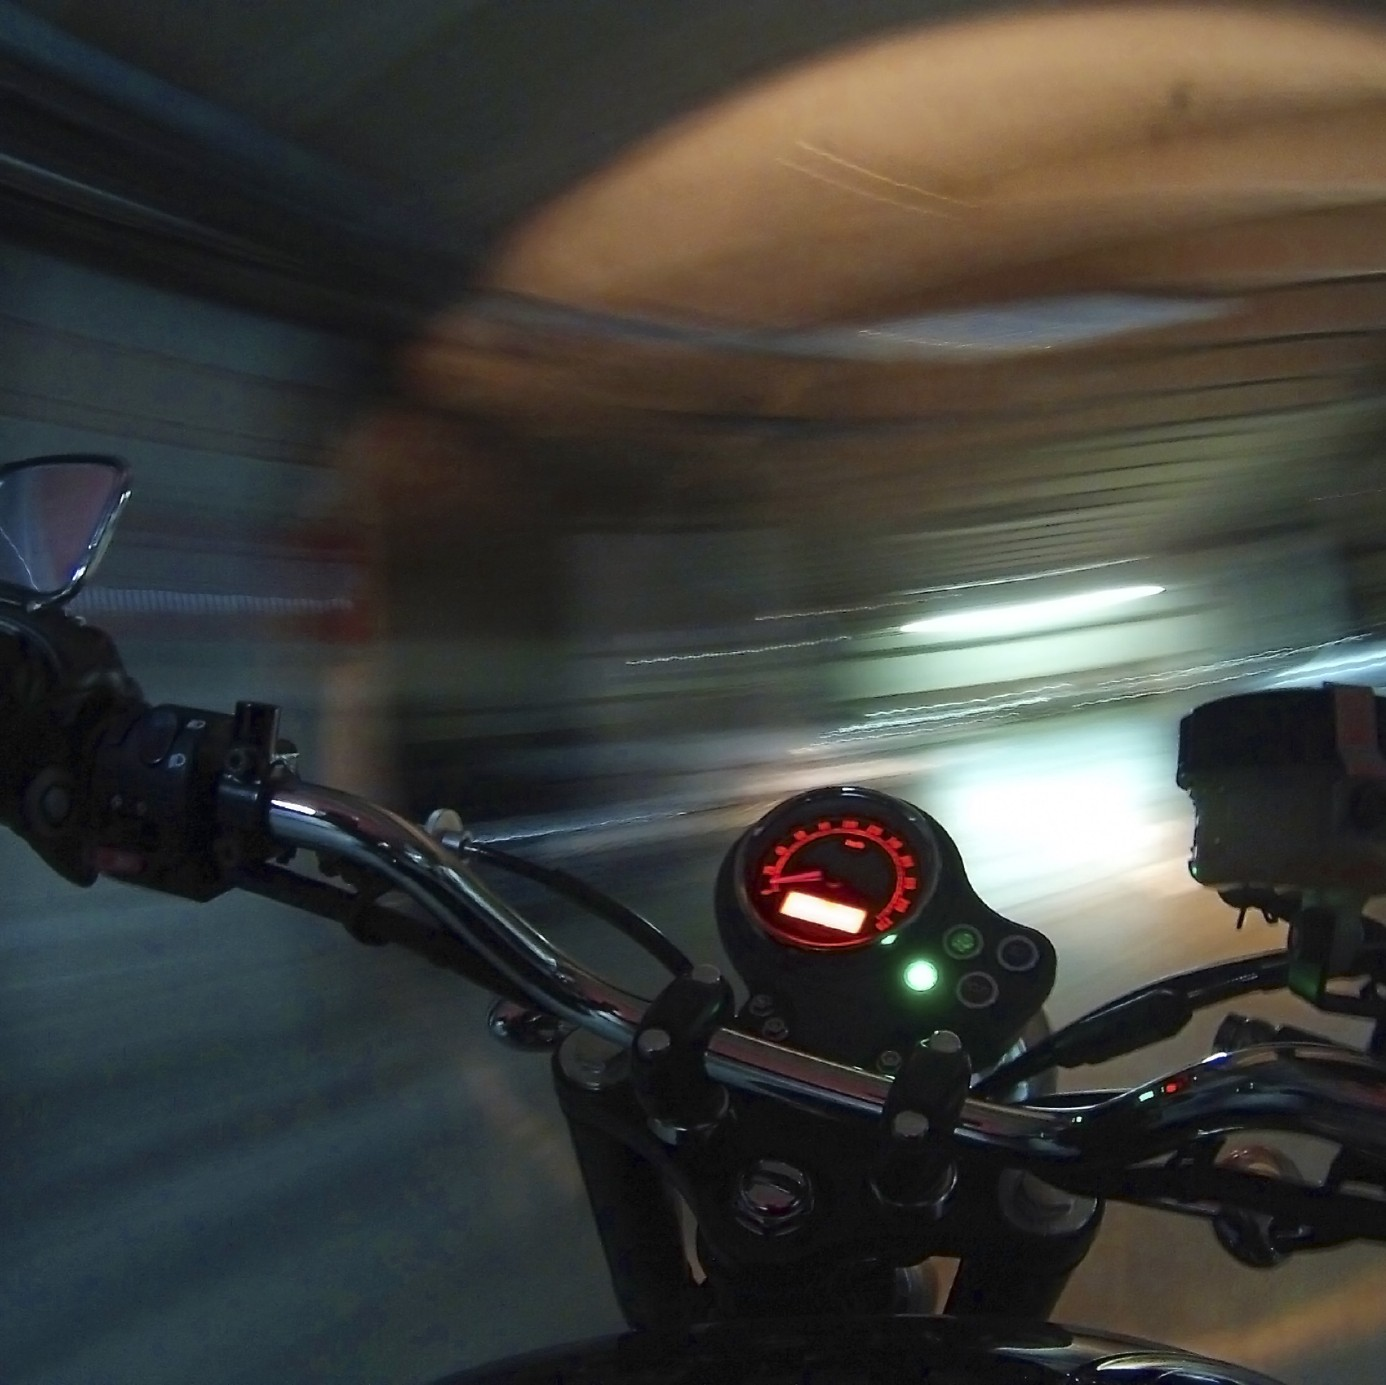 motorbike with GoPro Camera